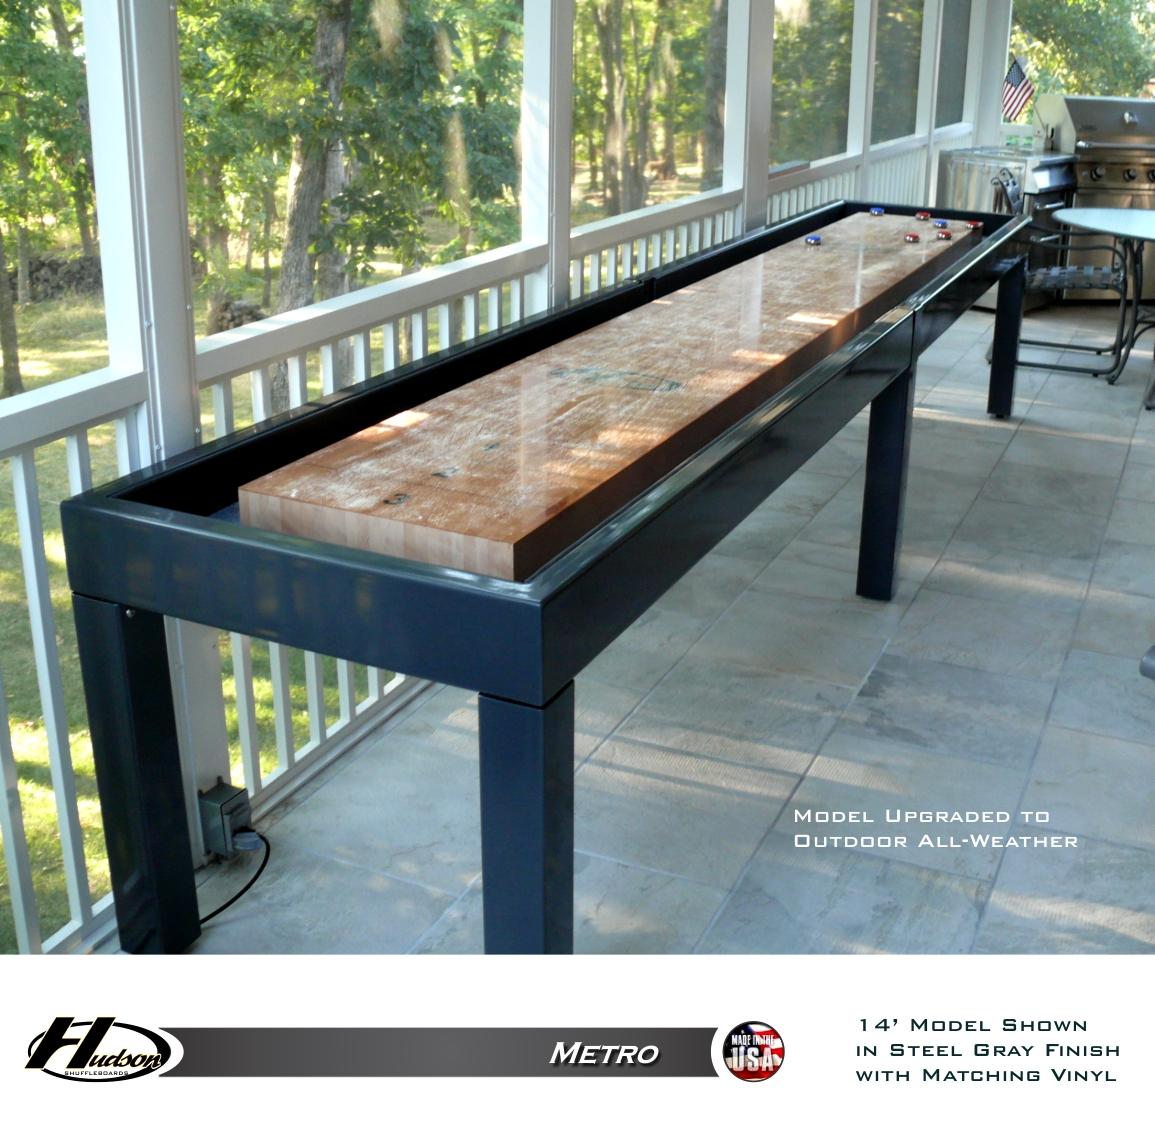 metro-shuffleboard-steel-gray-outdoor-all-weather-table